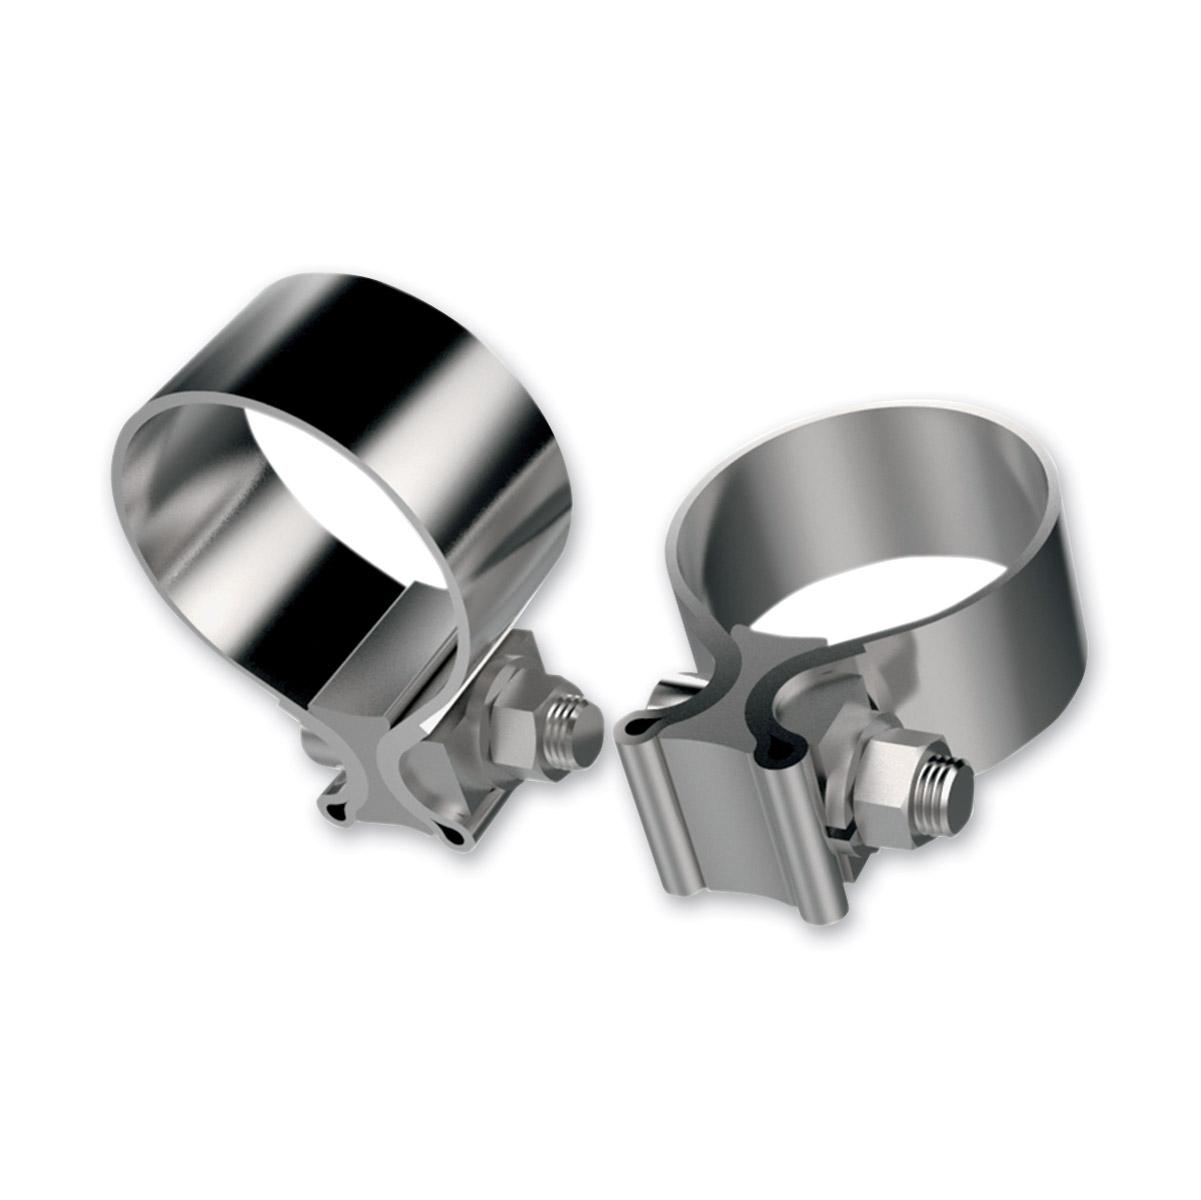 Khrome Werks Stainless Steel Muffler Clamps